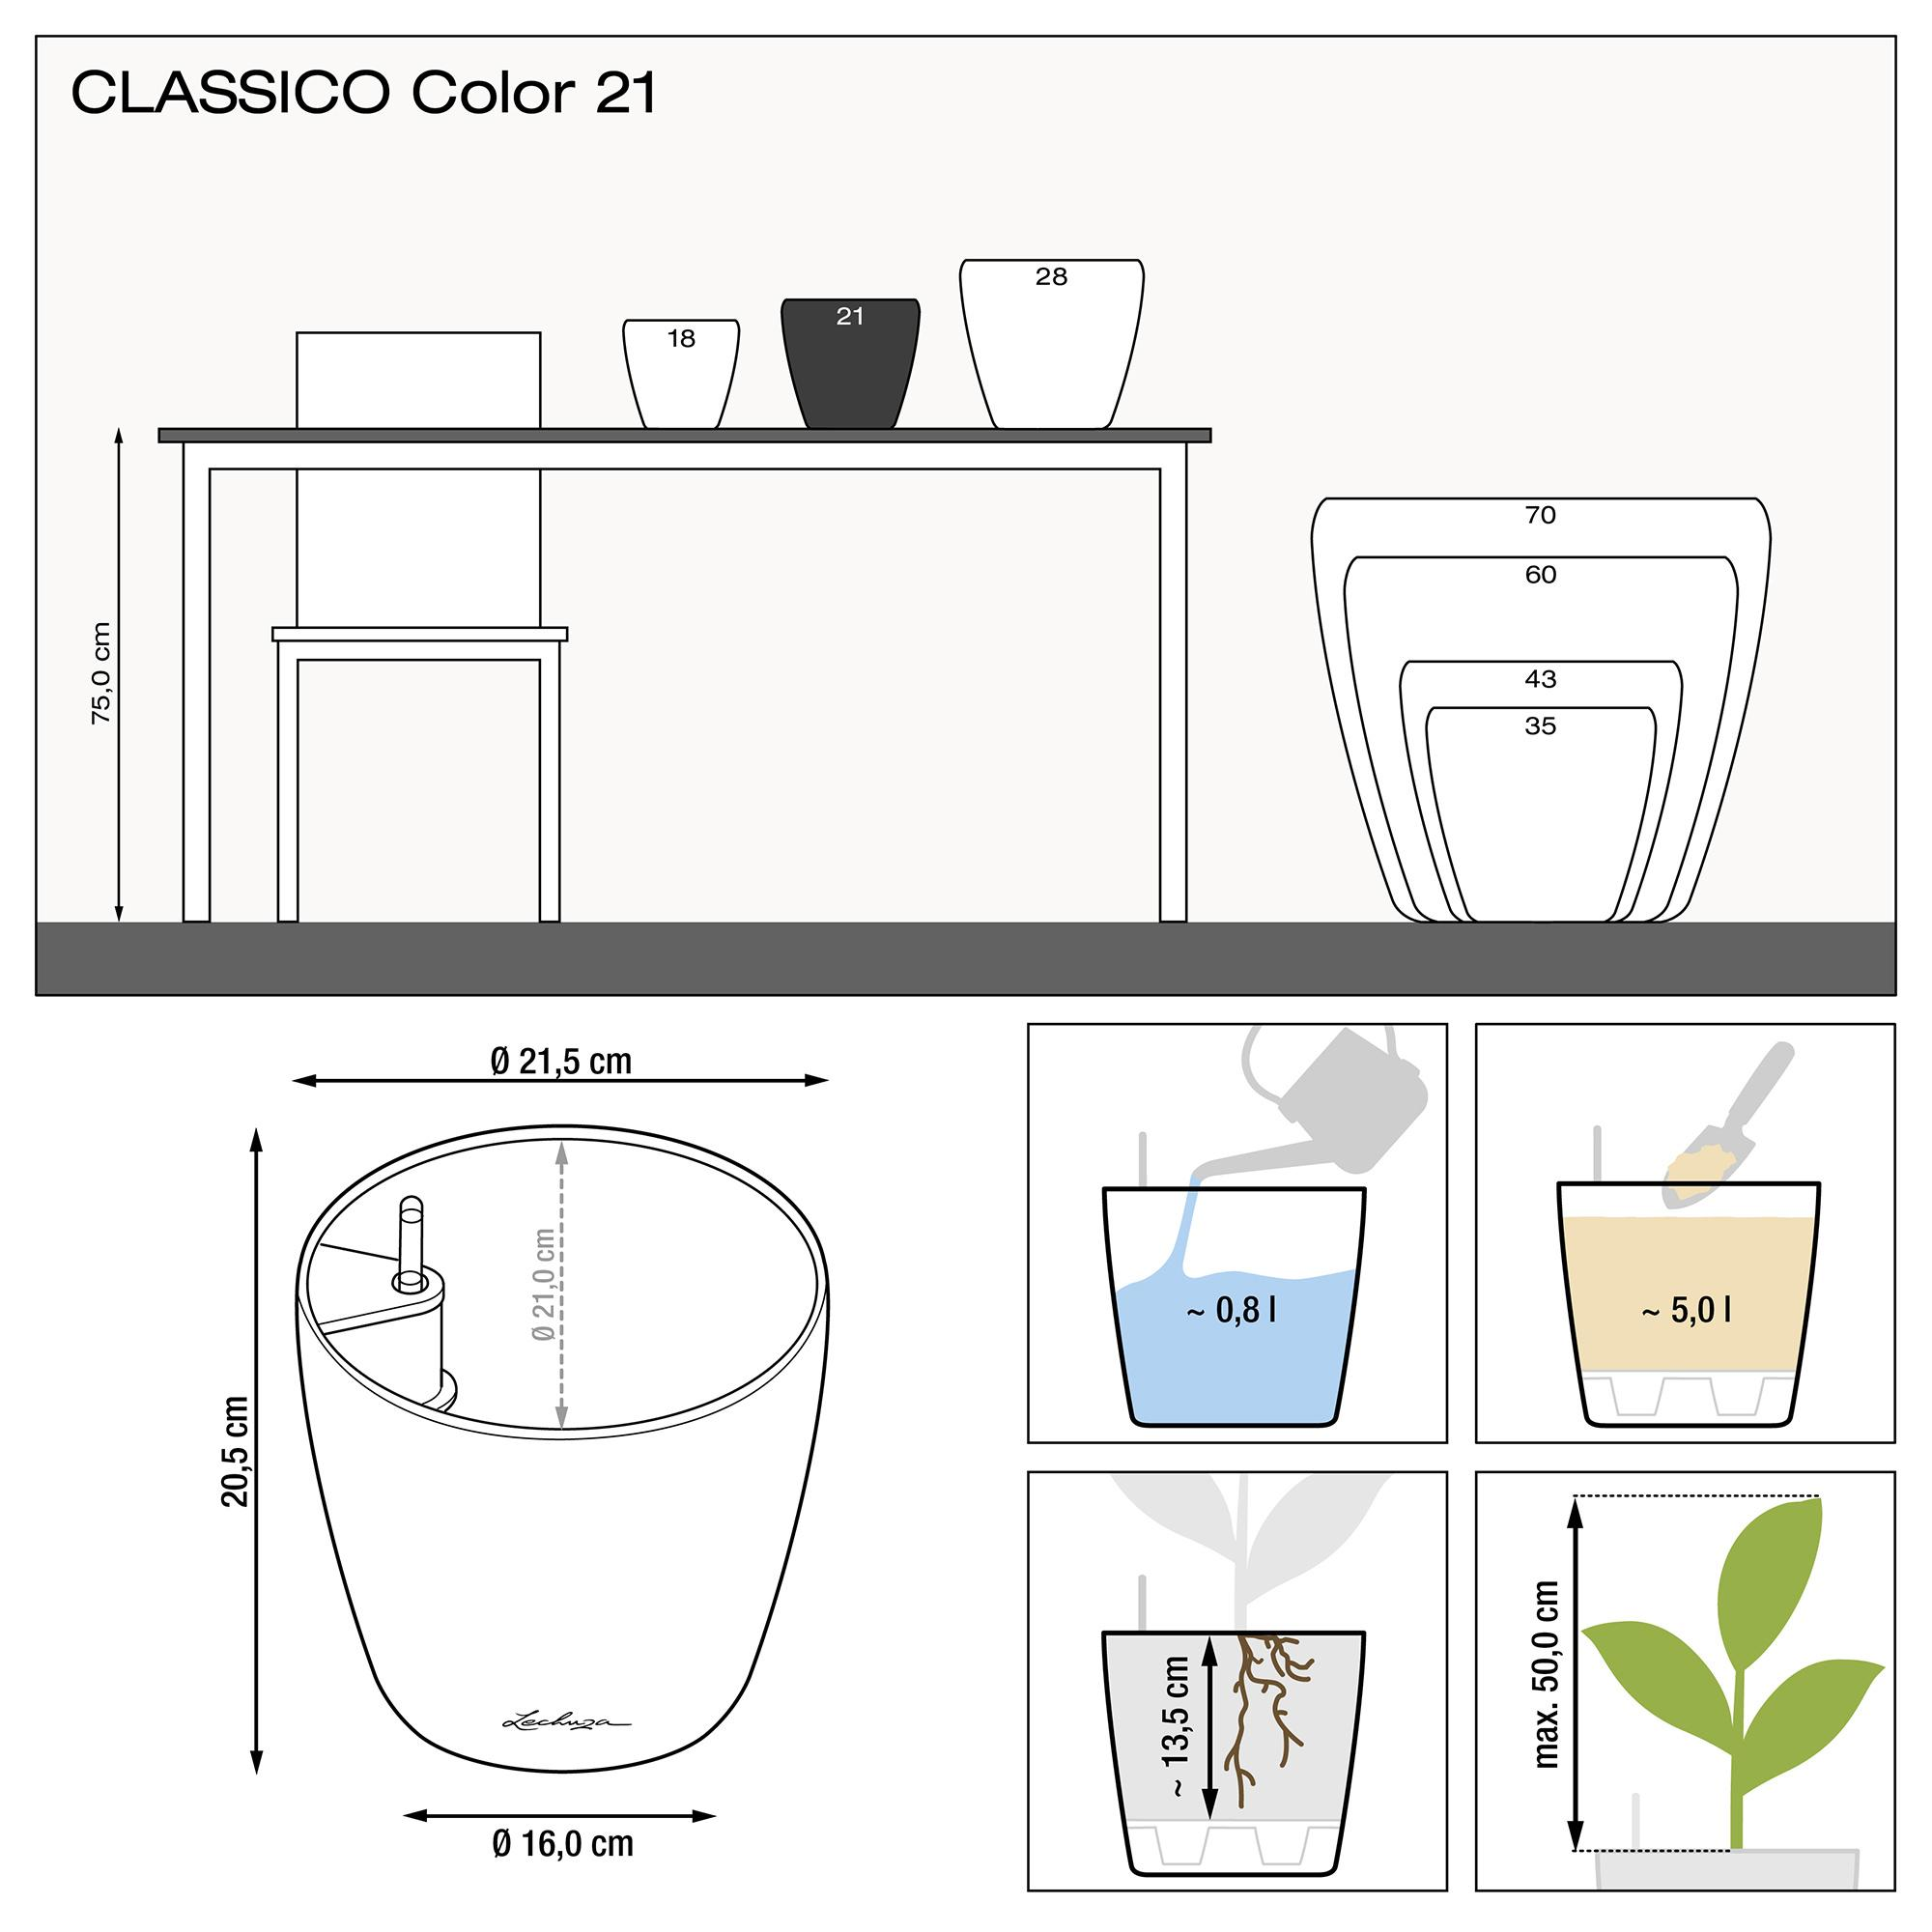 CLASSICO Color 21 slate - Image 2